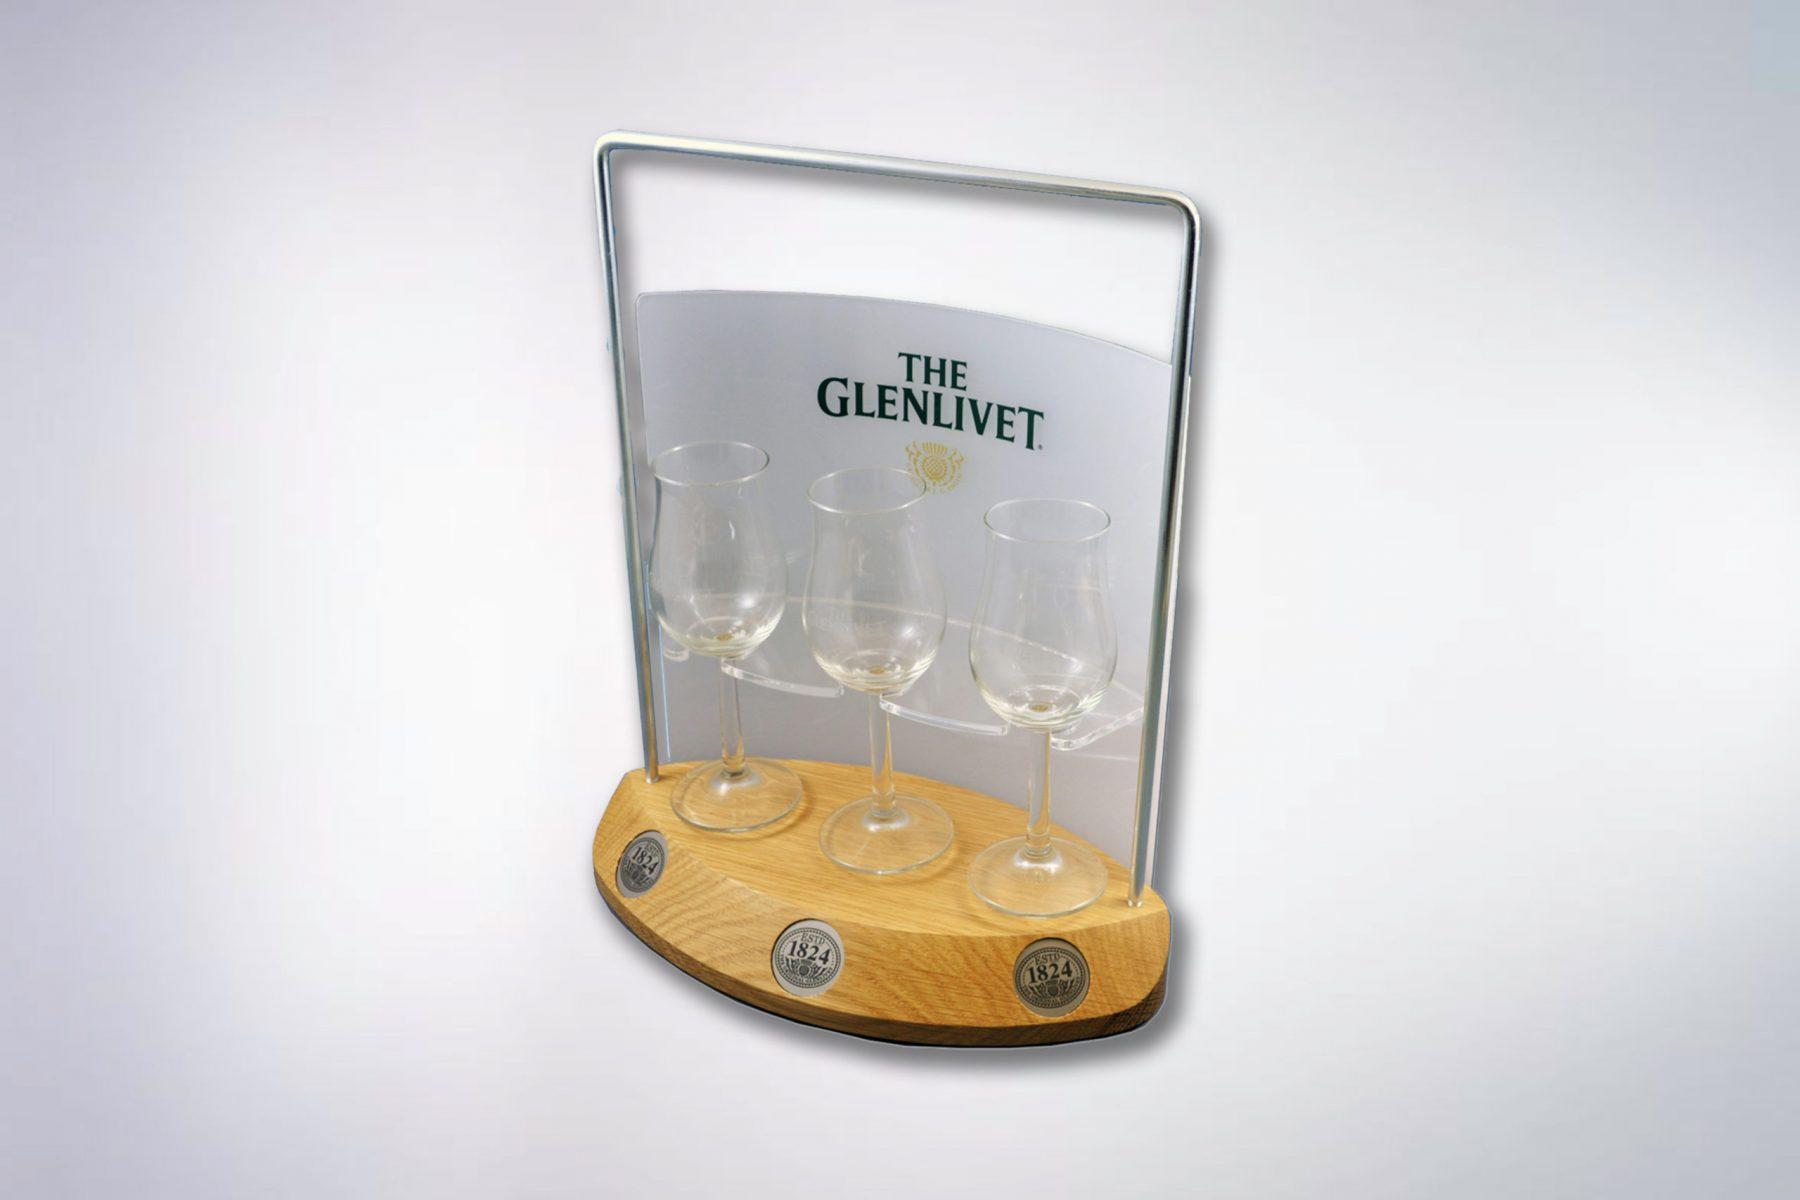 The-Glenlivet-Tastingtool-scaled